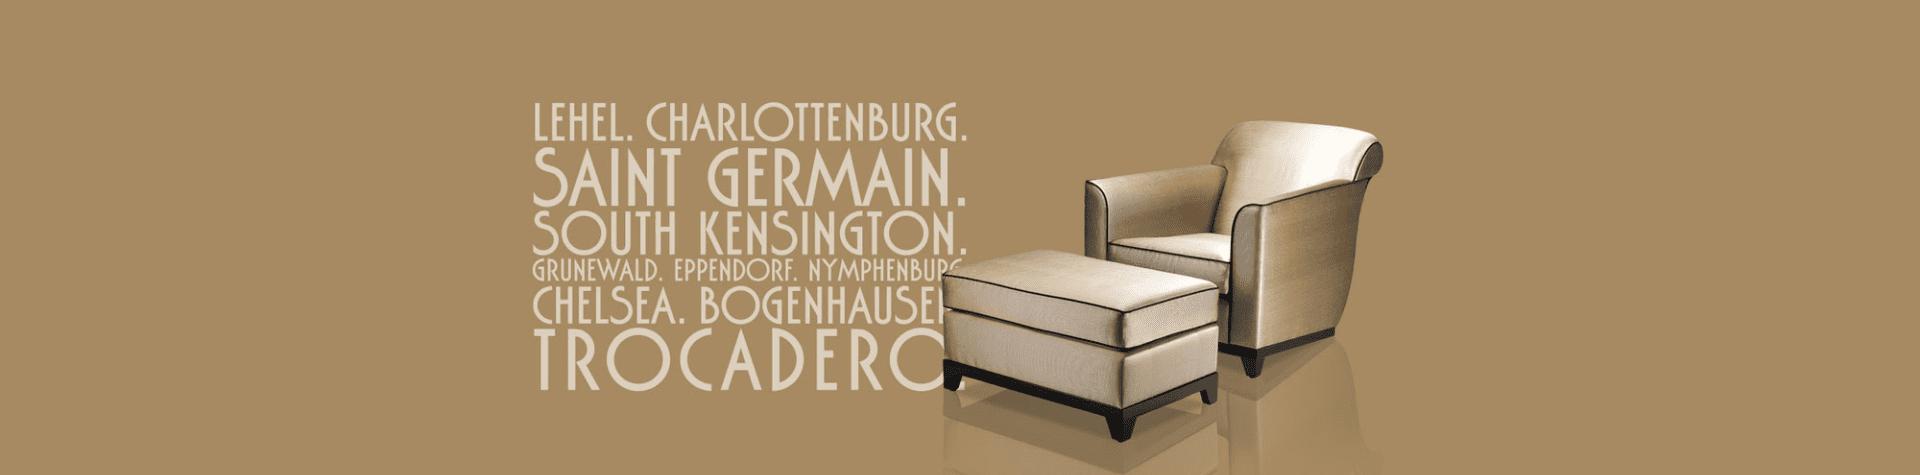 gold-lehel-charlottenburg-vollbreit